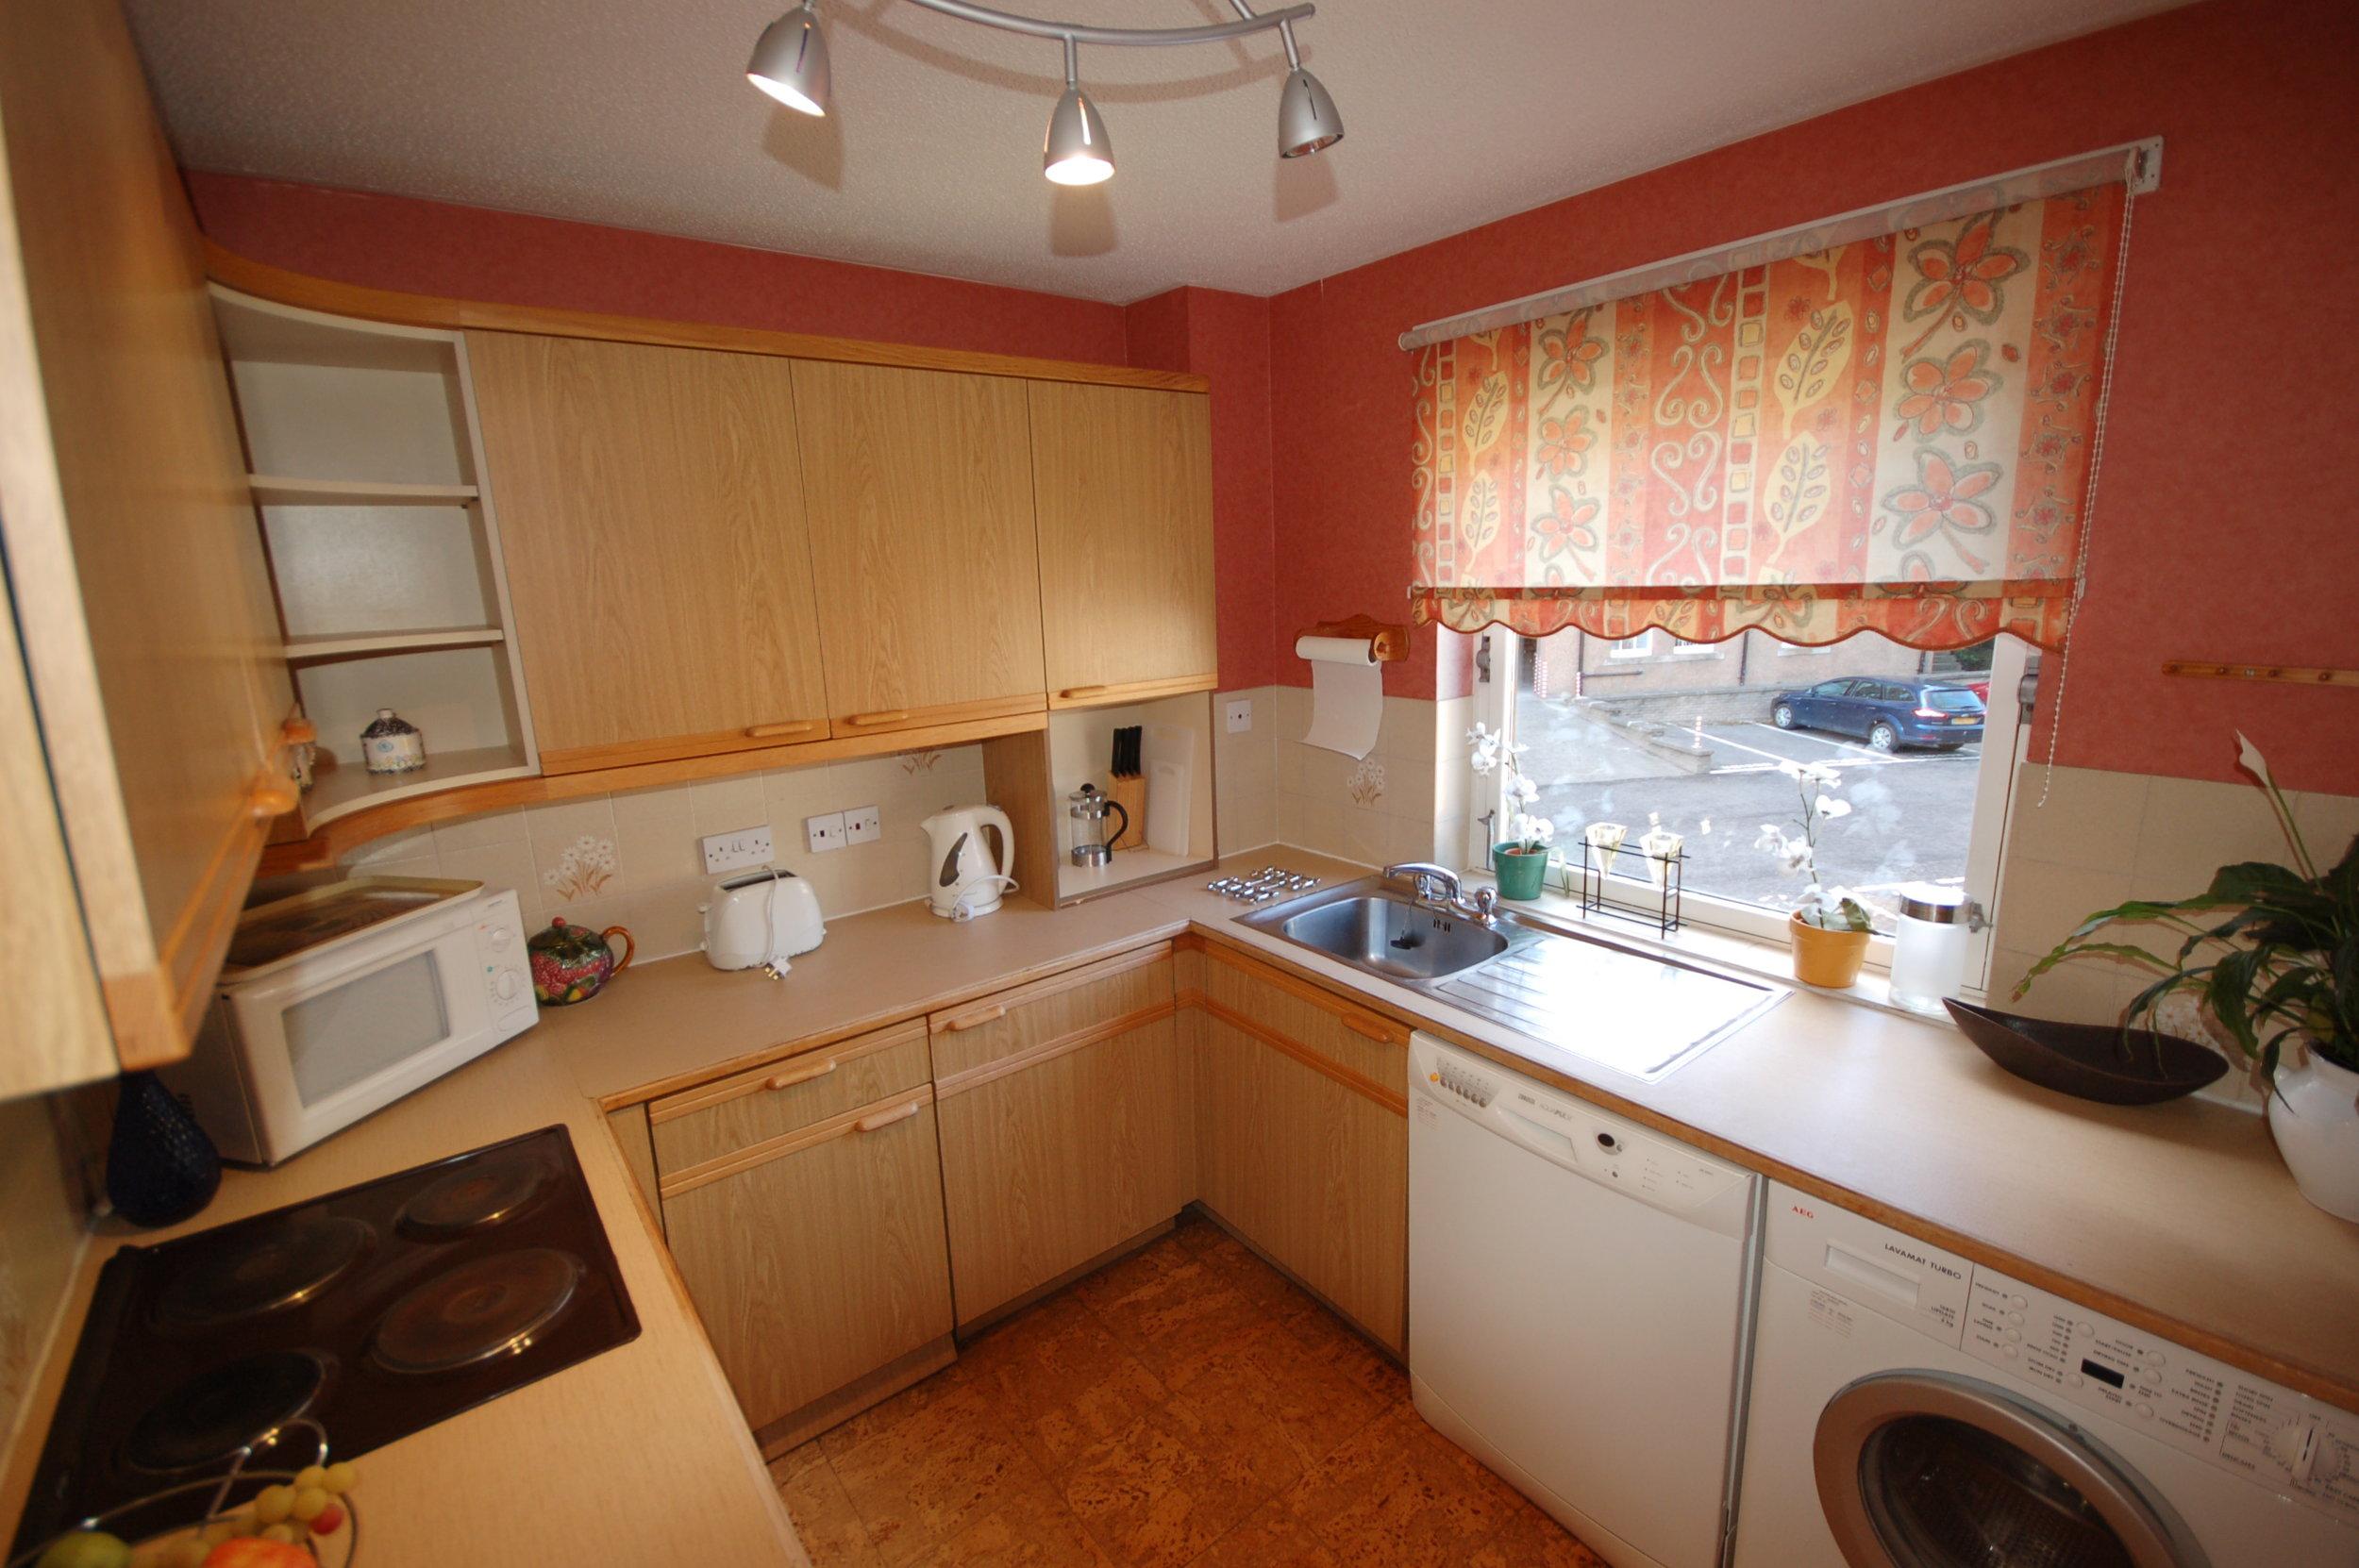 kitchen_5800284116_o.jpg